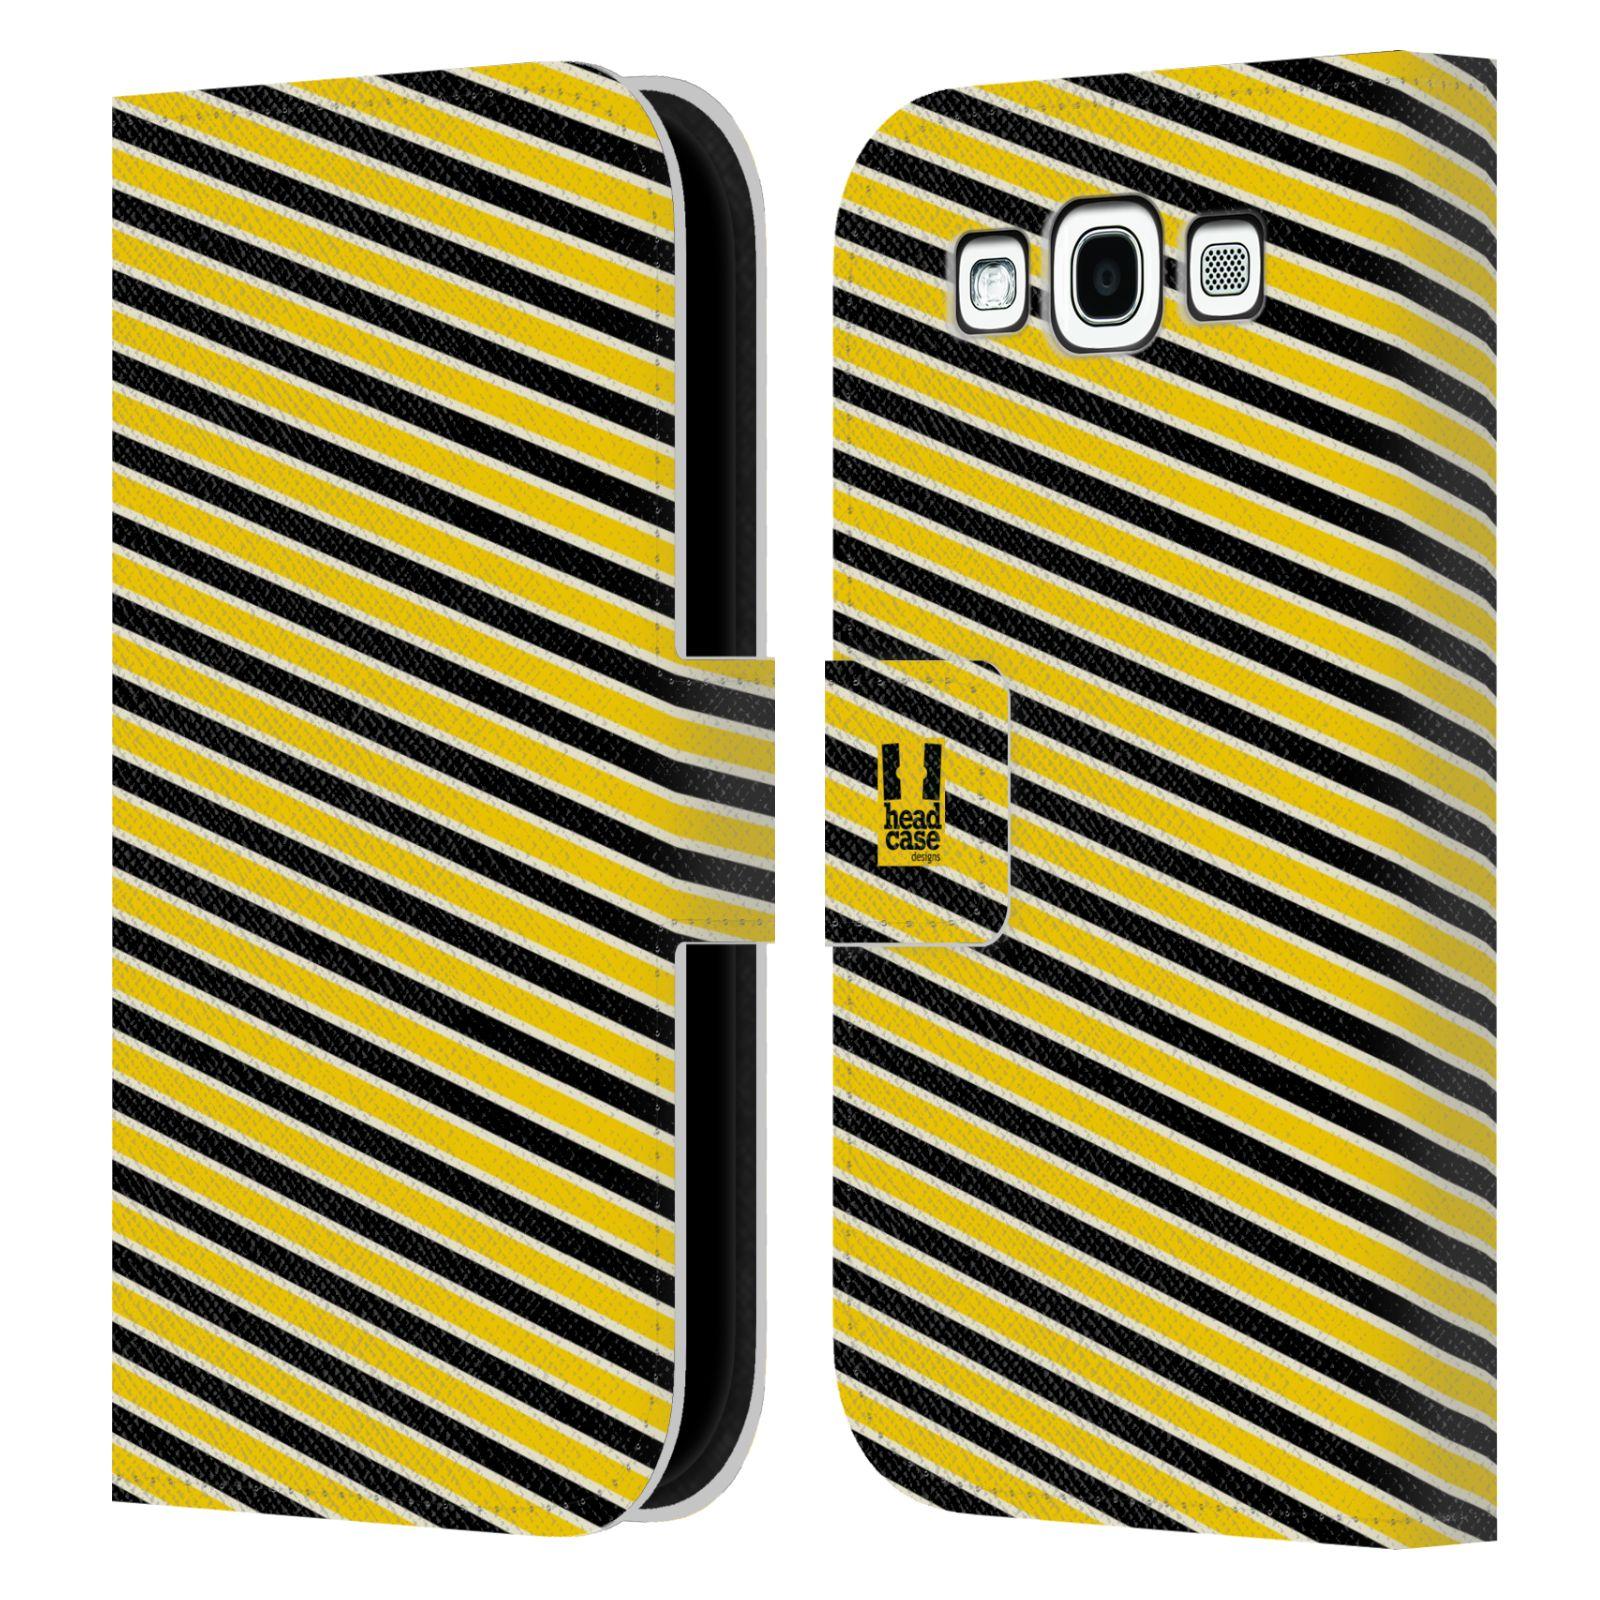 HEAD CASE Flipové pouzdro pro mobil Samsung Galaxy S3 VČELÍ VZOR pruhy žlutá a černá